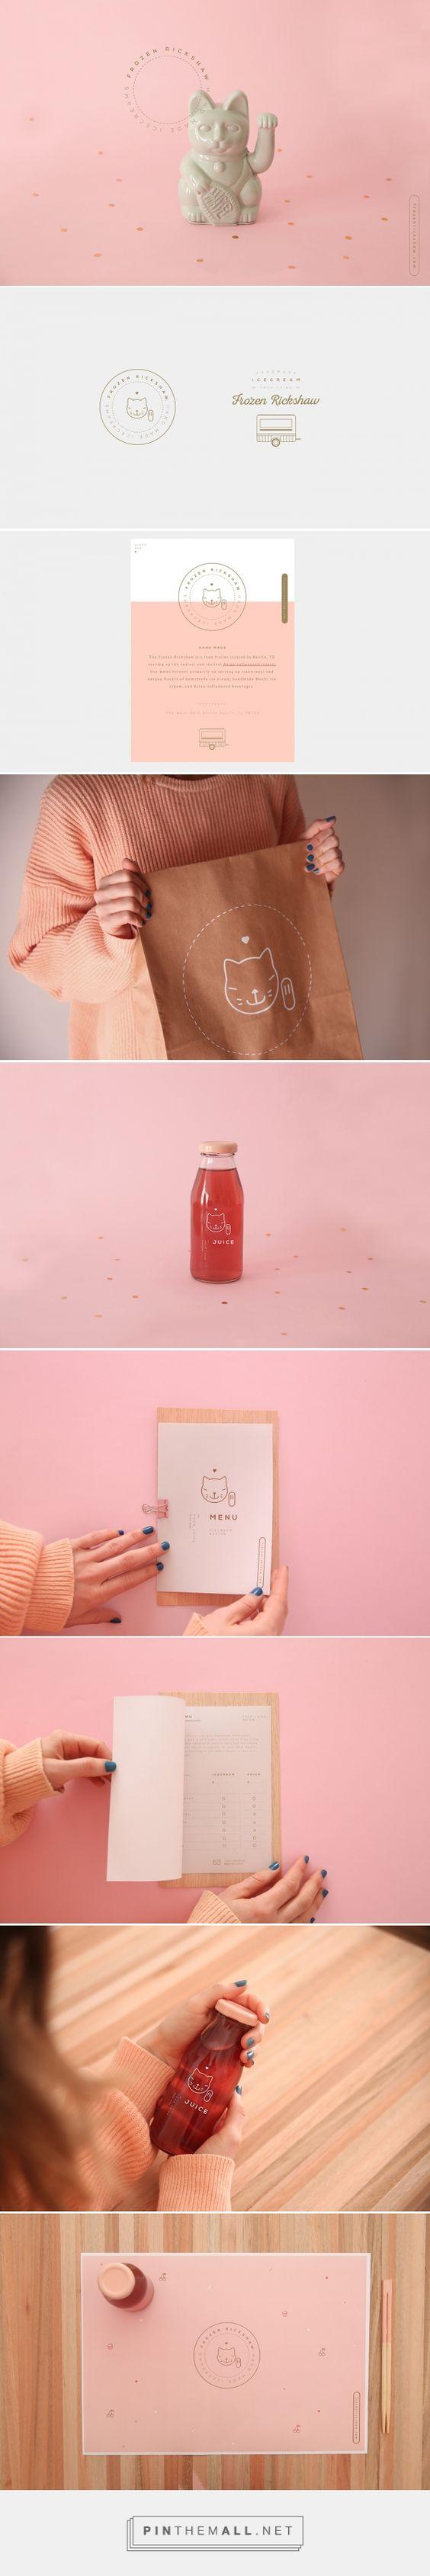 Frozen Rickshaw Branding by Un Barco on Behance   Fivestar Branding – Design and Branding Agency & Inspiration Gallery